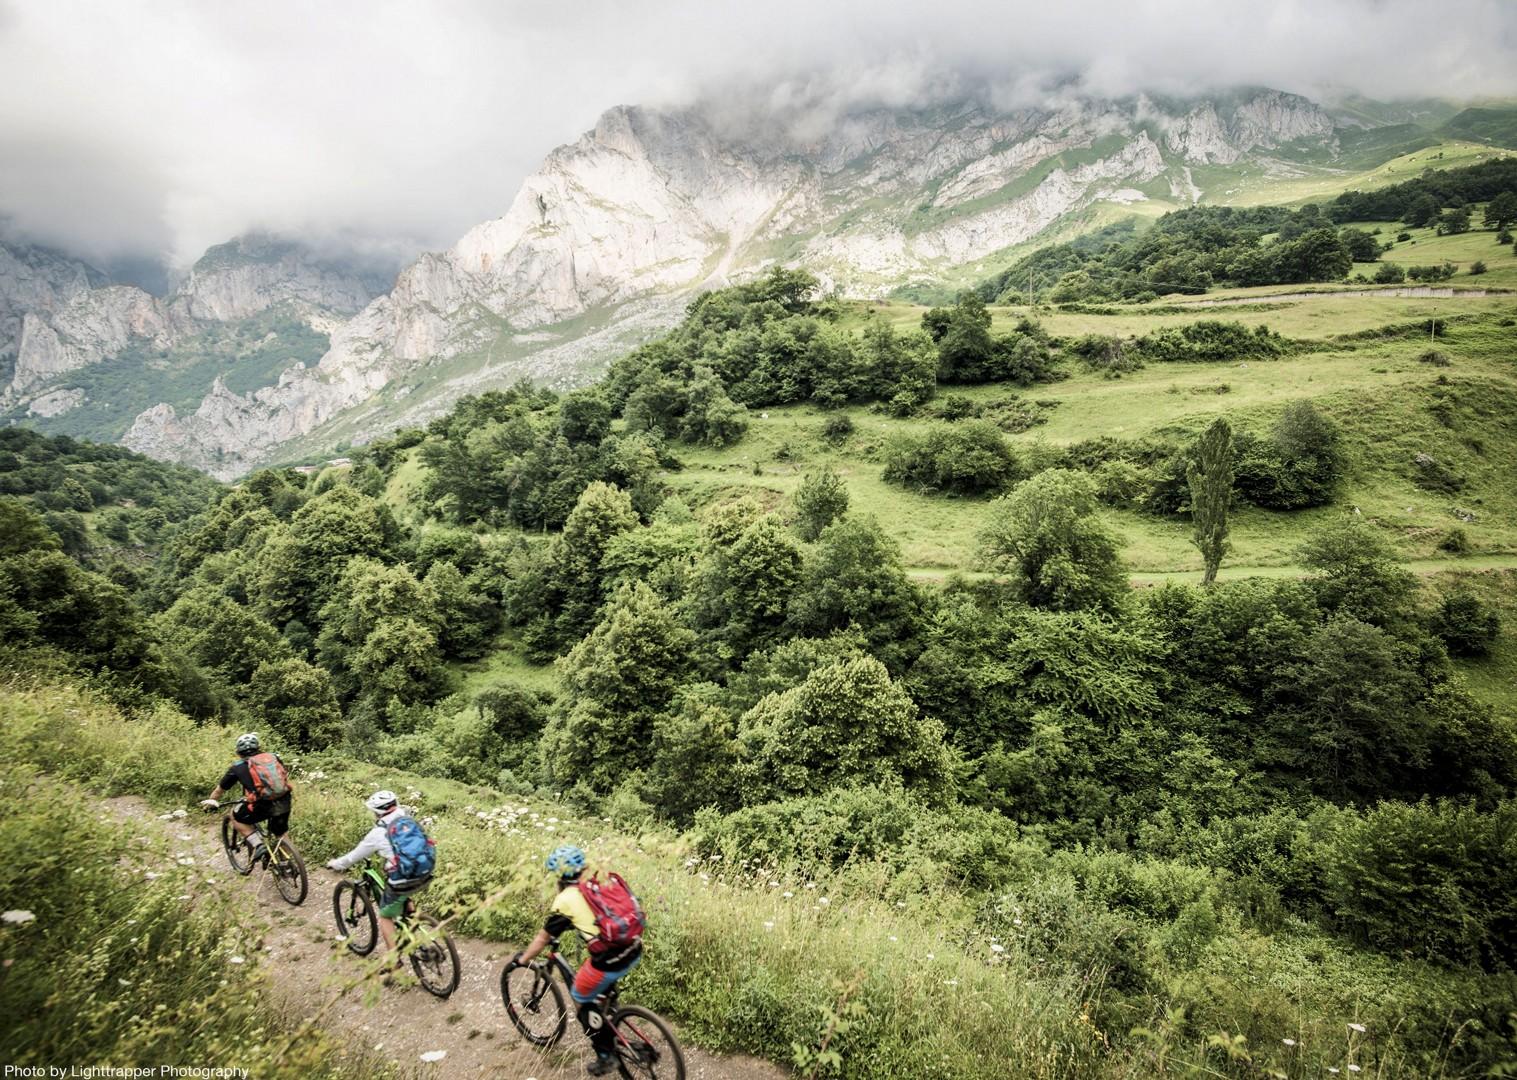 group-exploration-adventure-mountain-biking-northern-spain-picos-de-europa.jpg - Spain - Picos de Europa - Trans Picos - Guided Mountain Bike Holiday - Mountain Biking